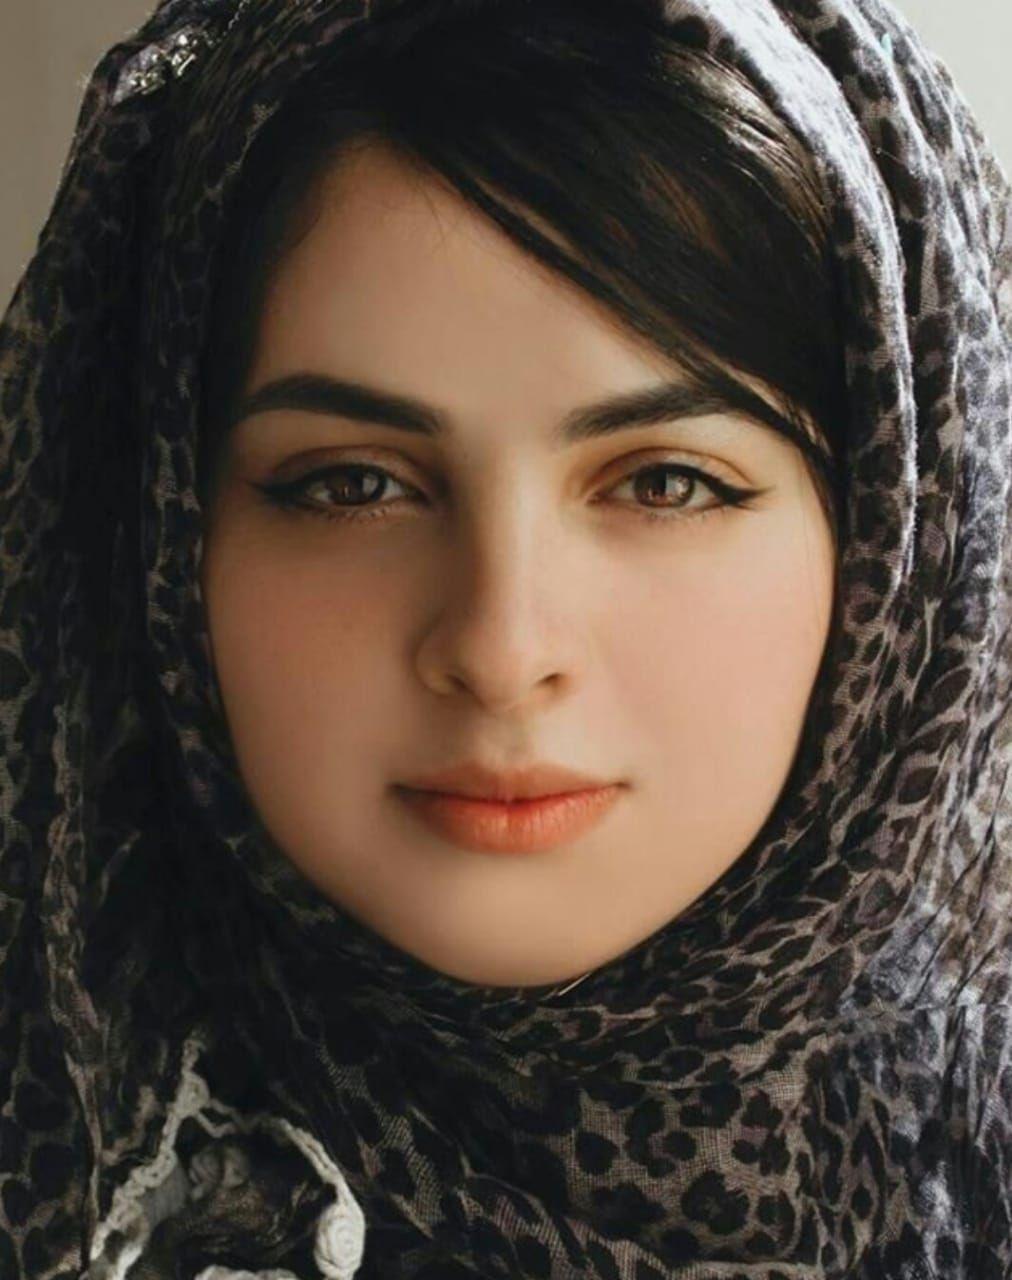 Pakistani girls pictures gallery: Pakistani girl photo